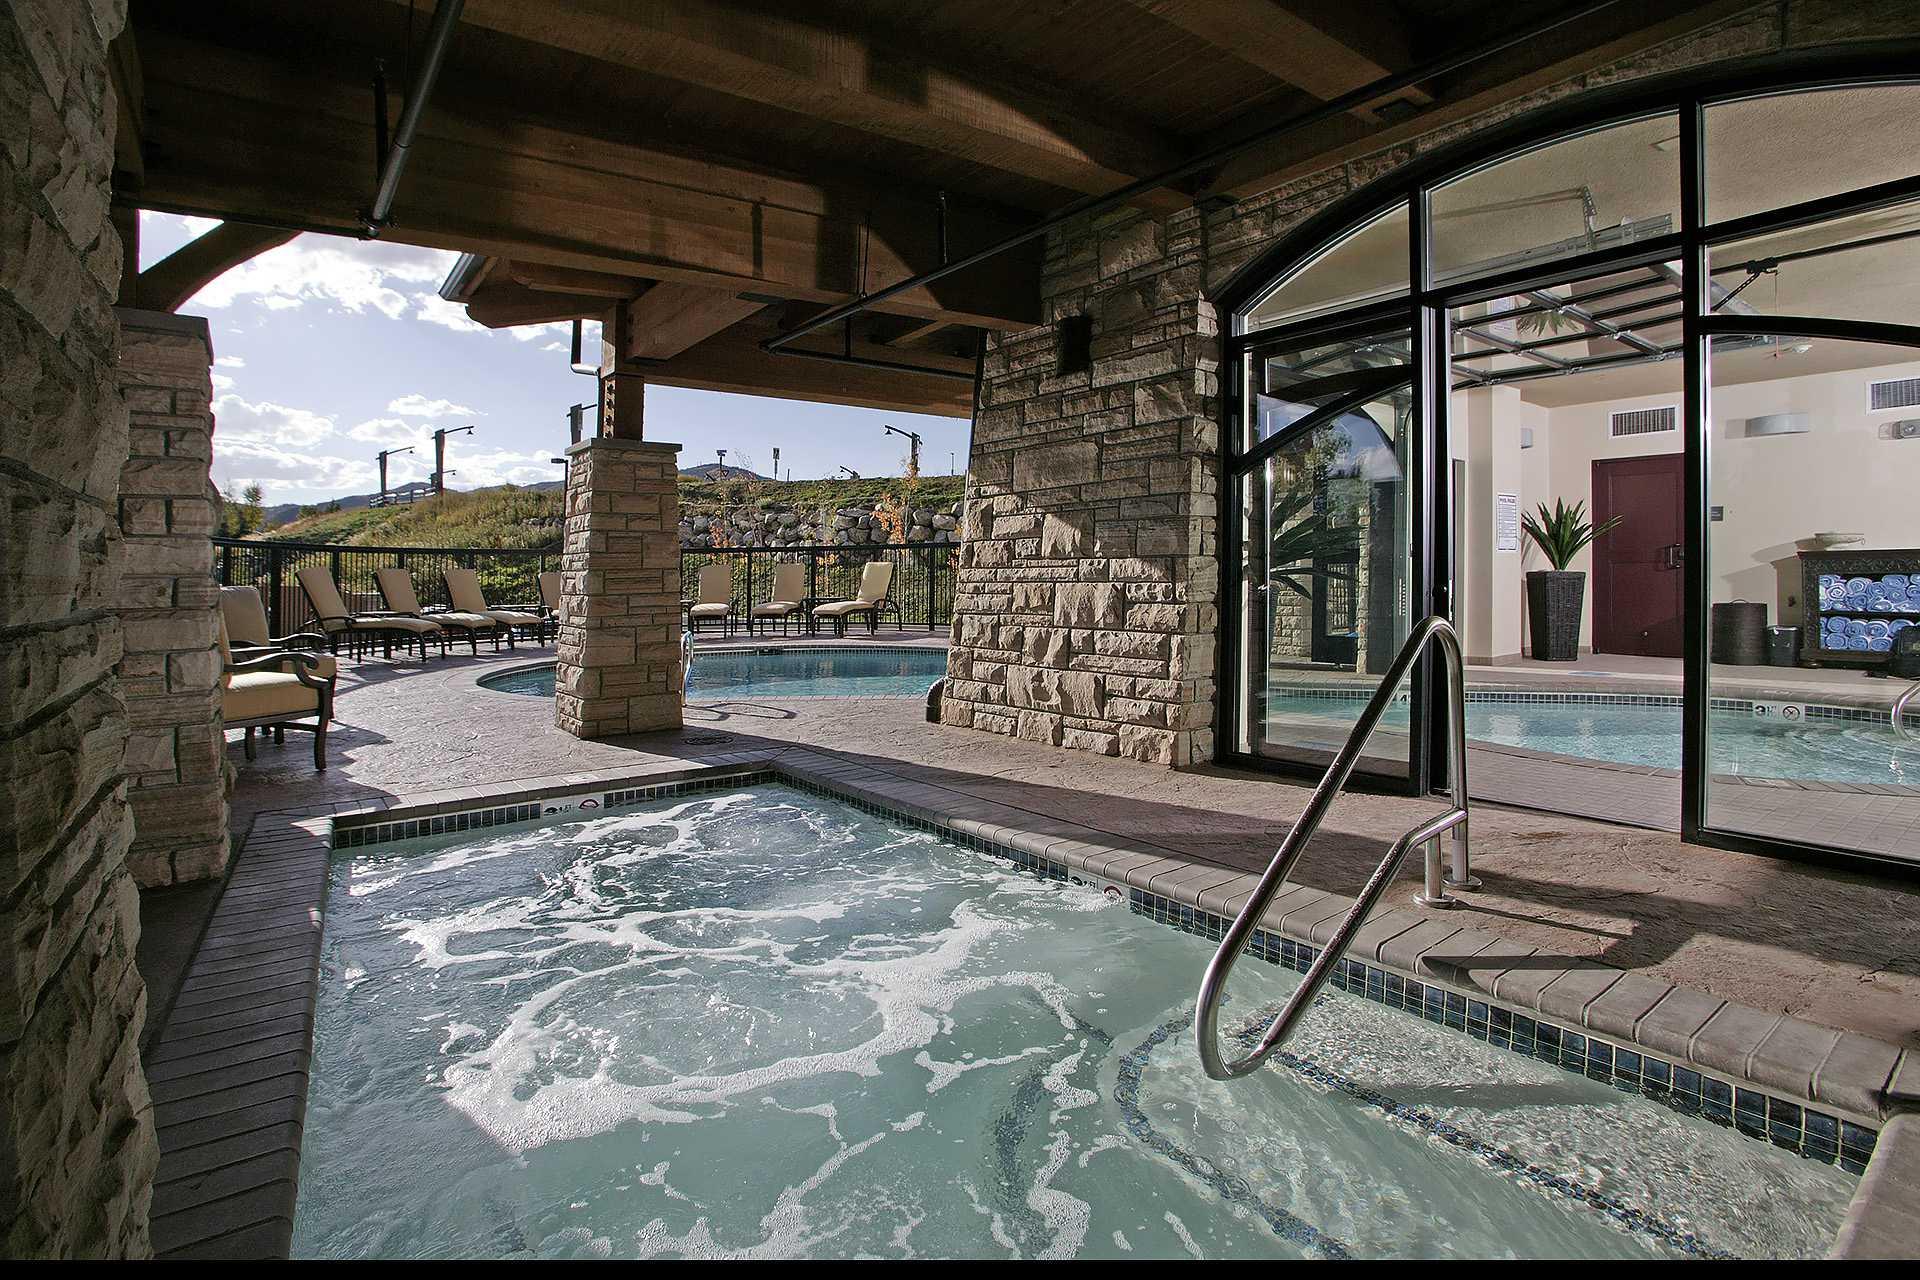 HM5B: Highmark Steamboat Springs